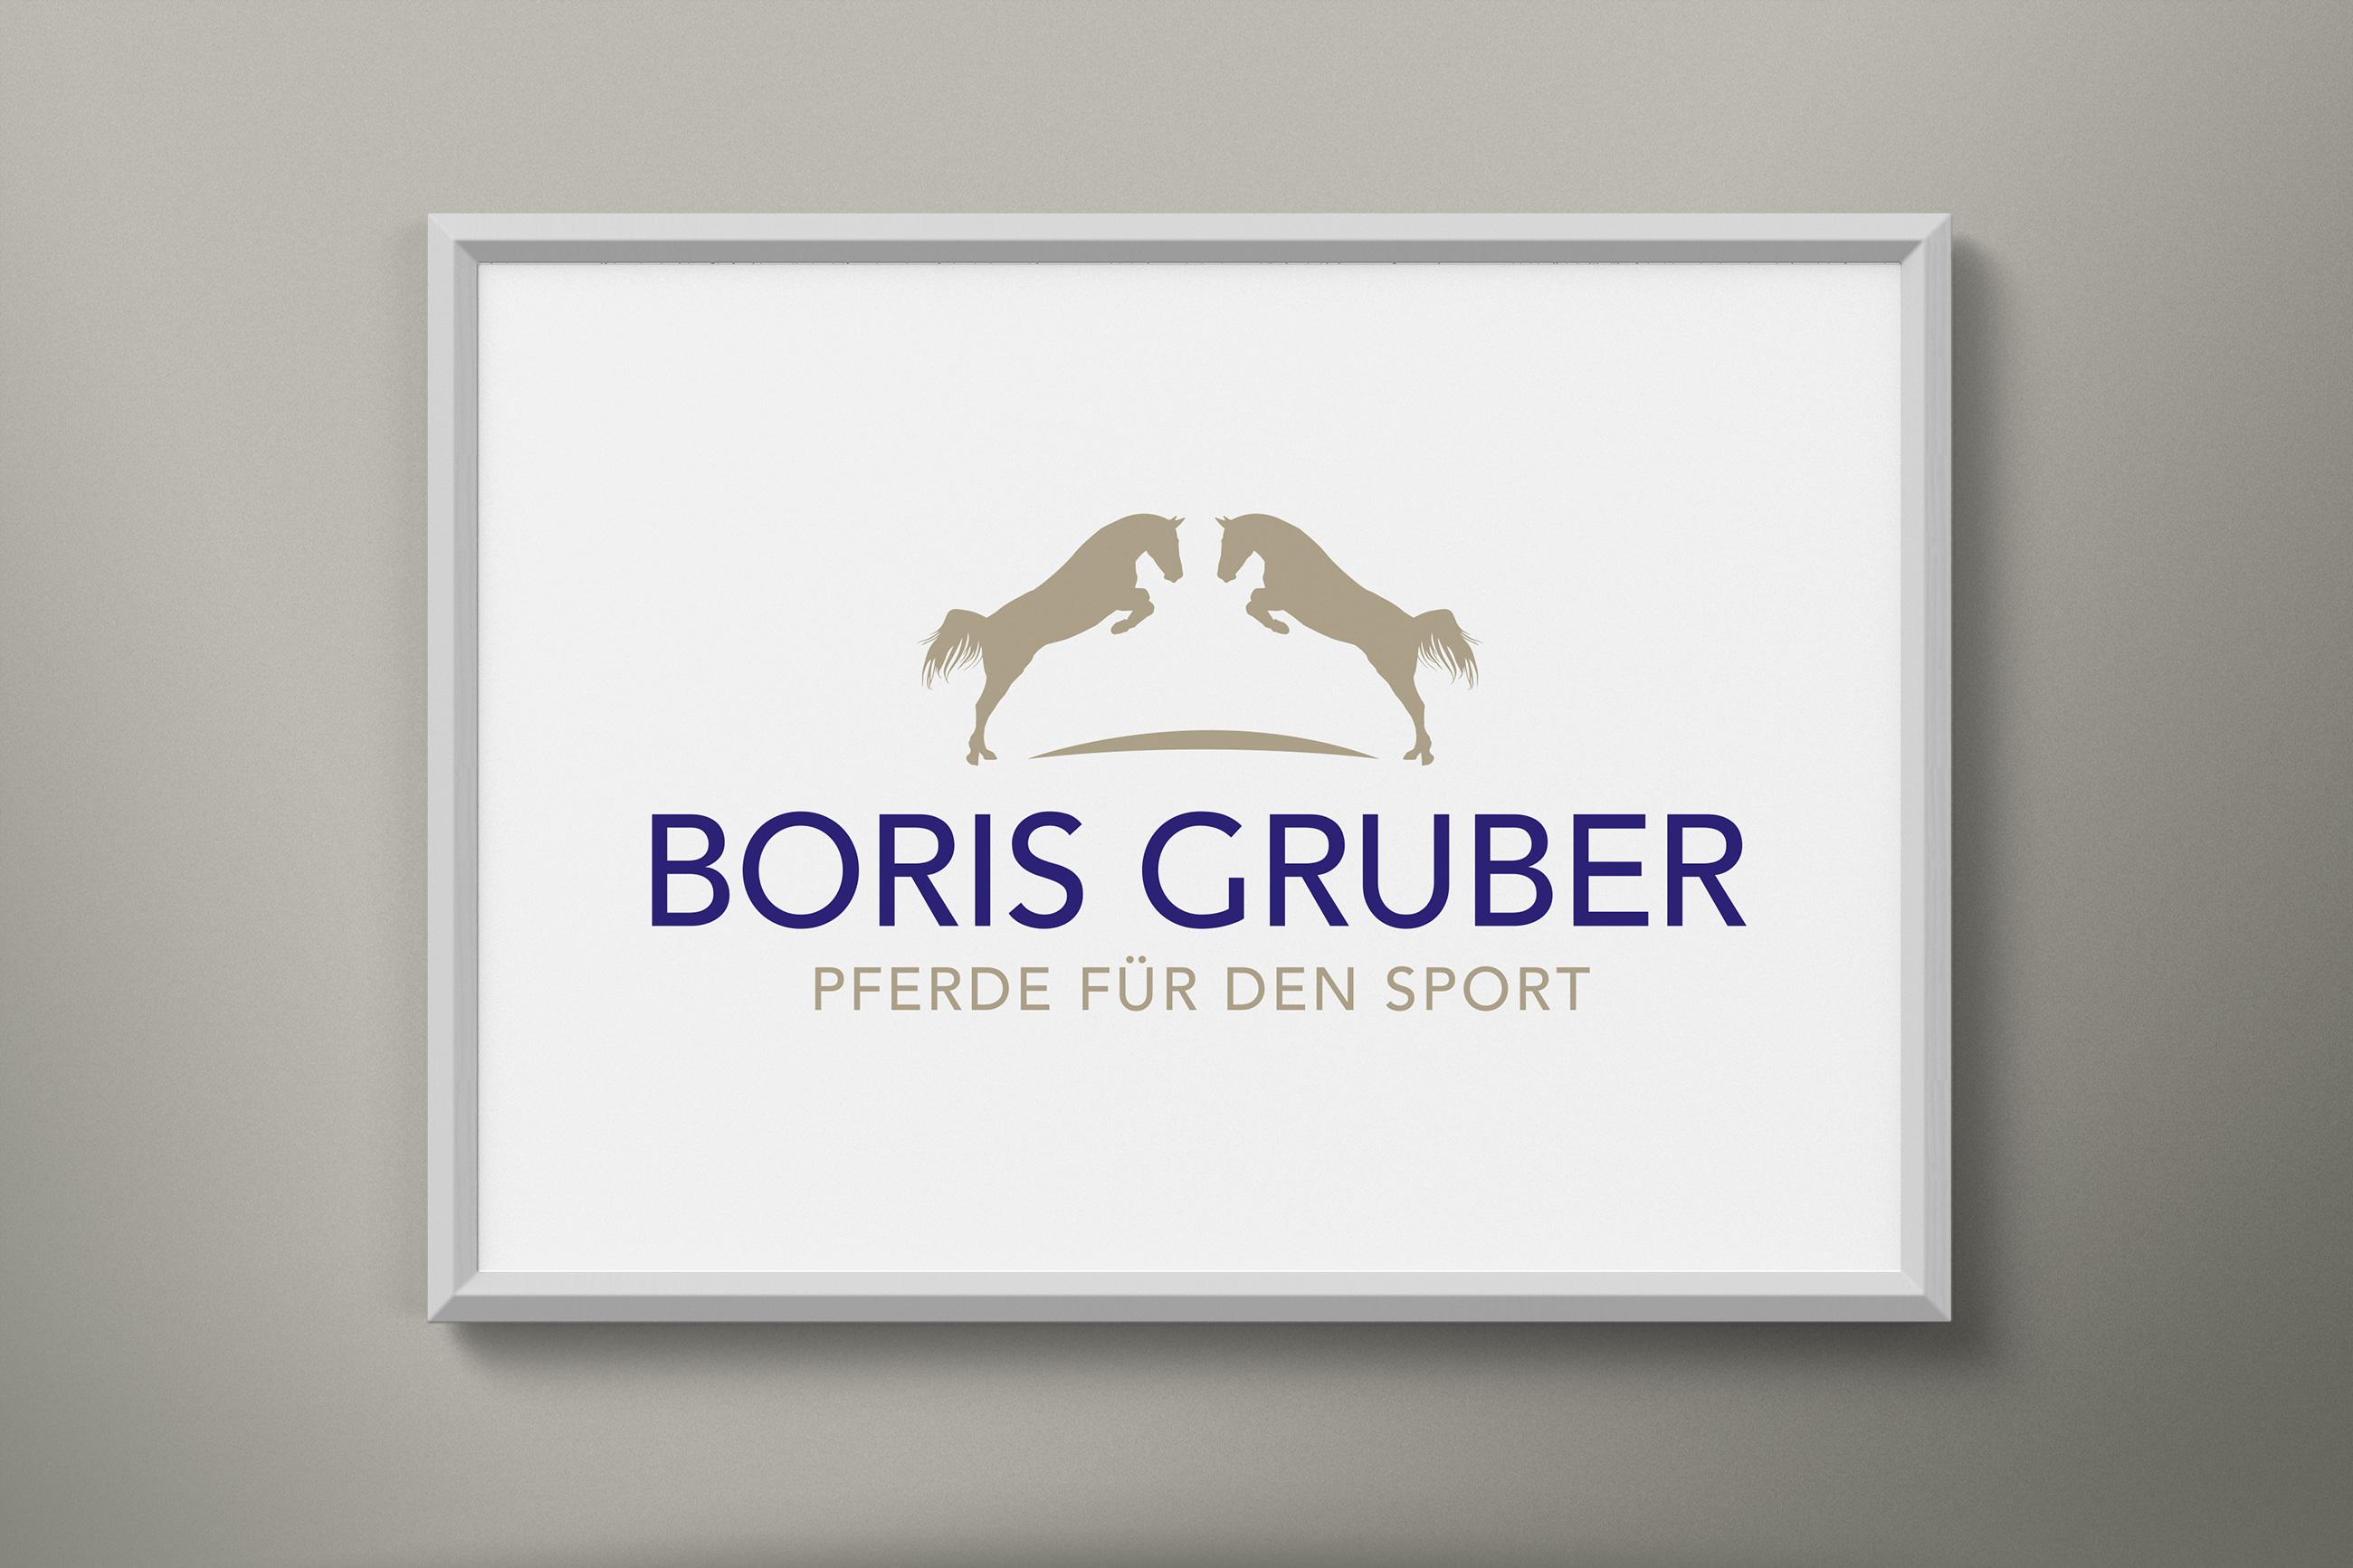 boris Gruber pferdezucht logo